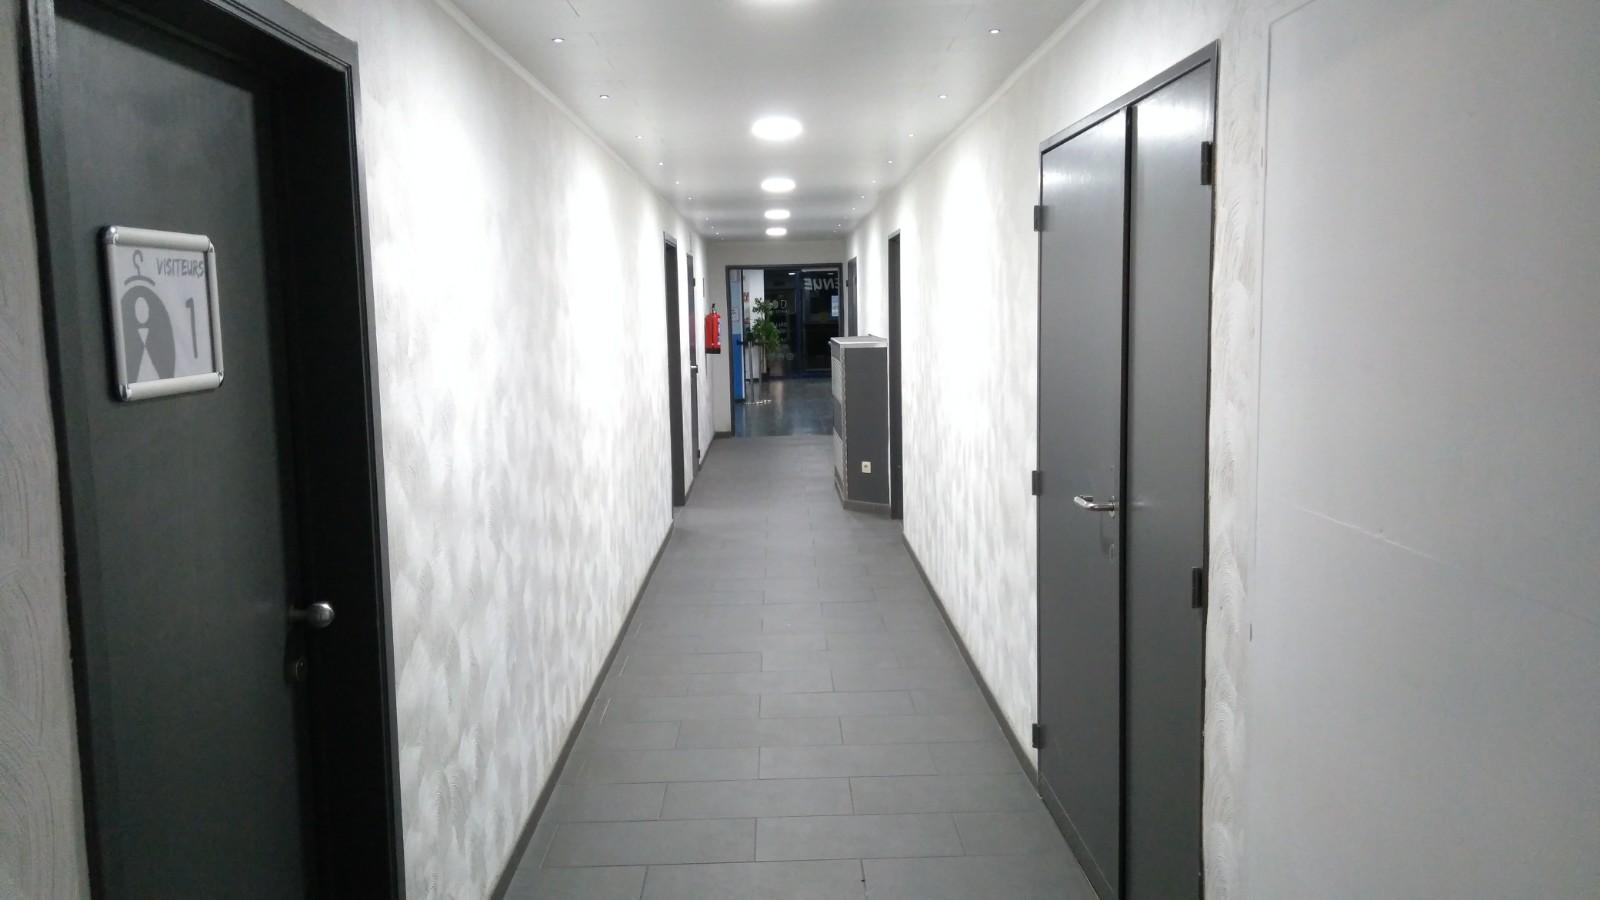 Couloir vestiaires hall